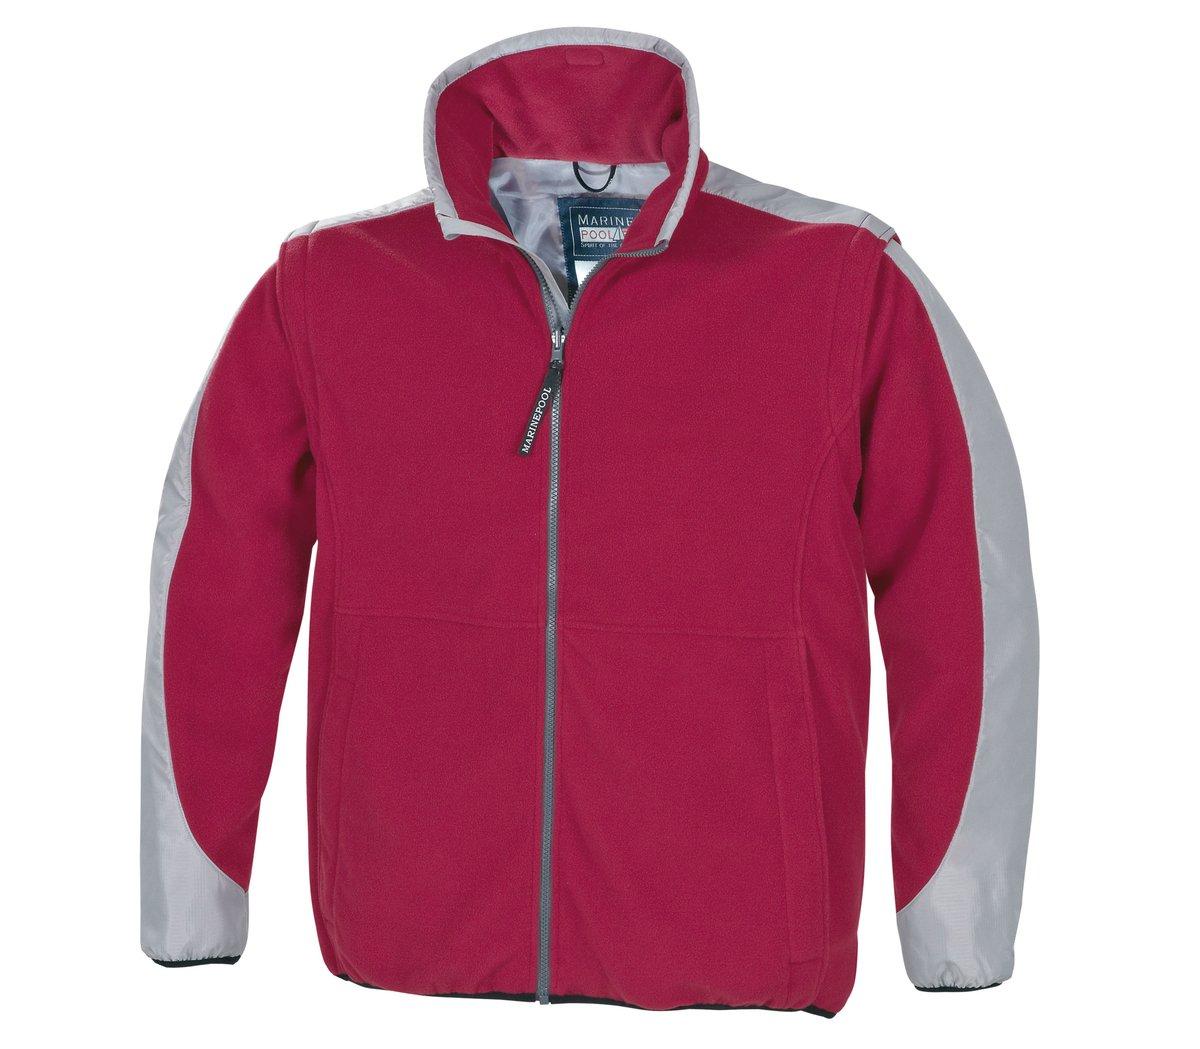 Rouge - Rouge XL Marinepool Stockholm Veste Polaire Hommes's